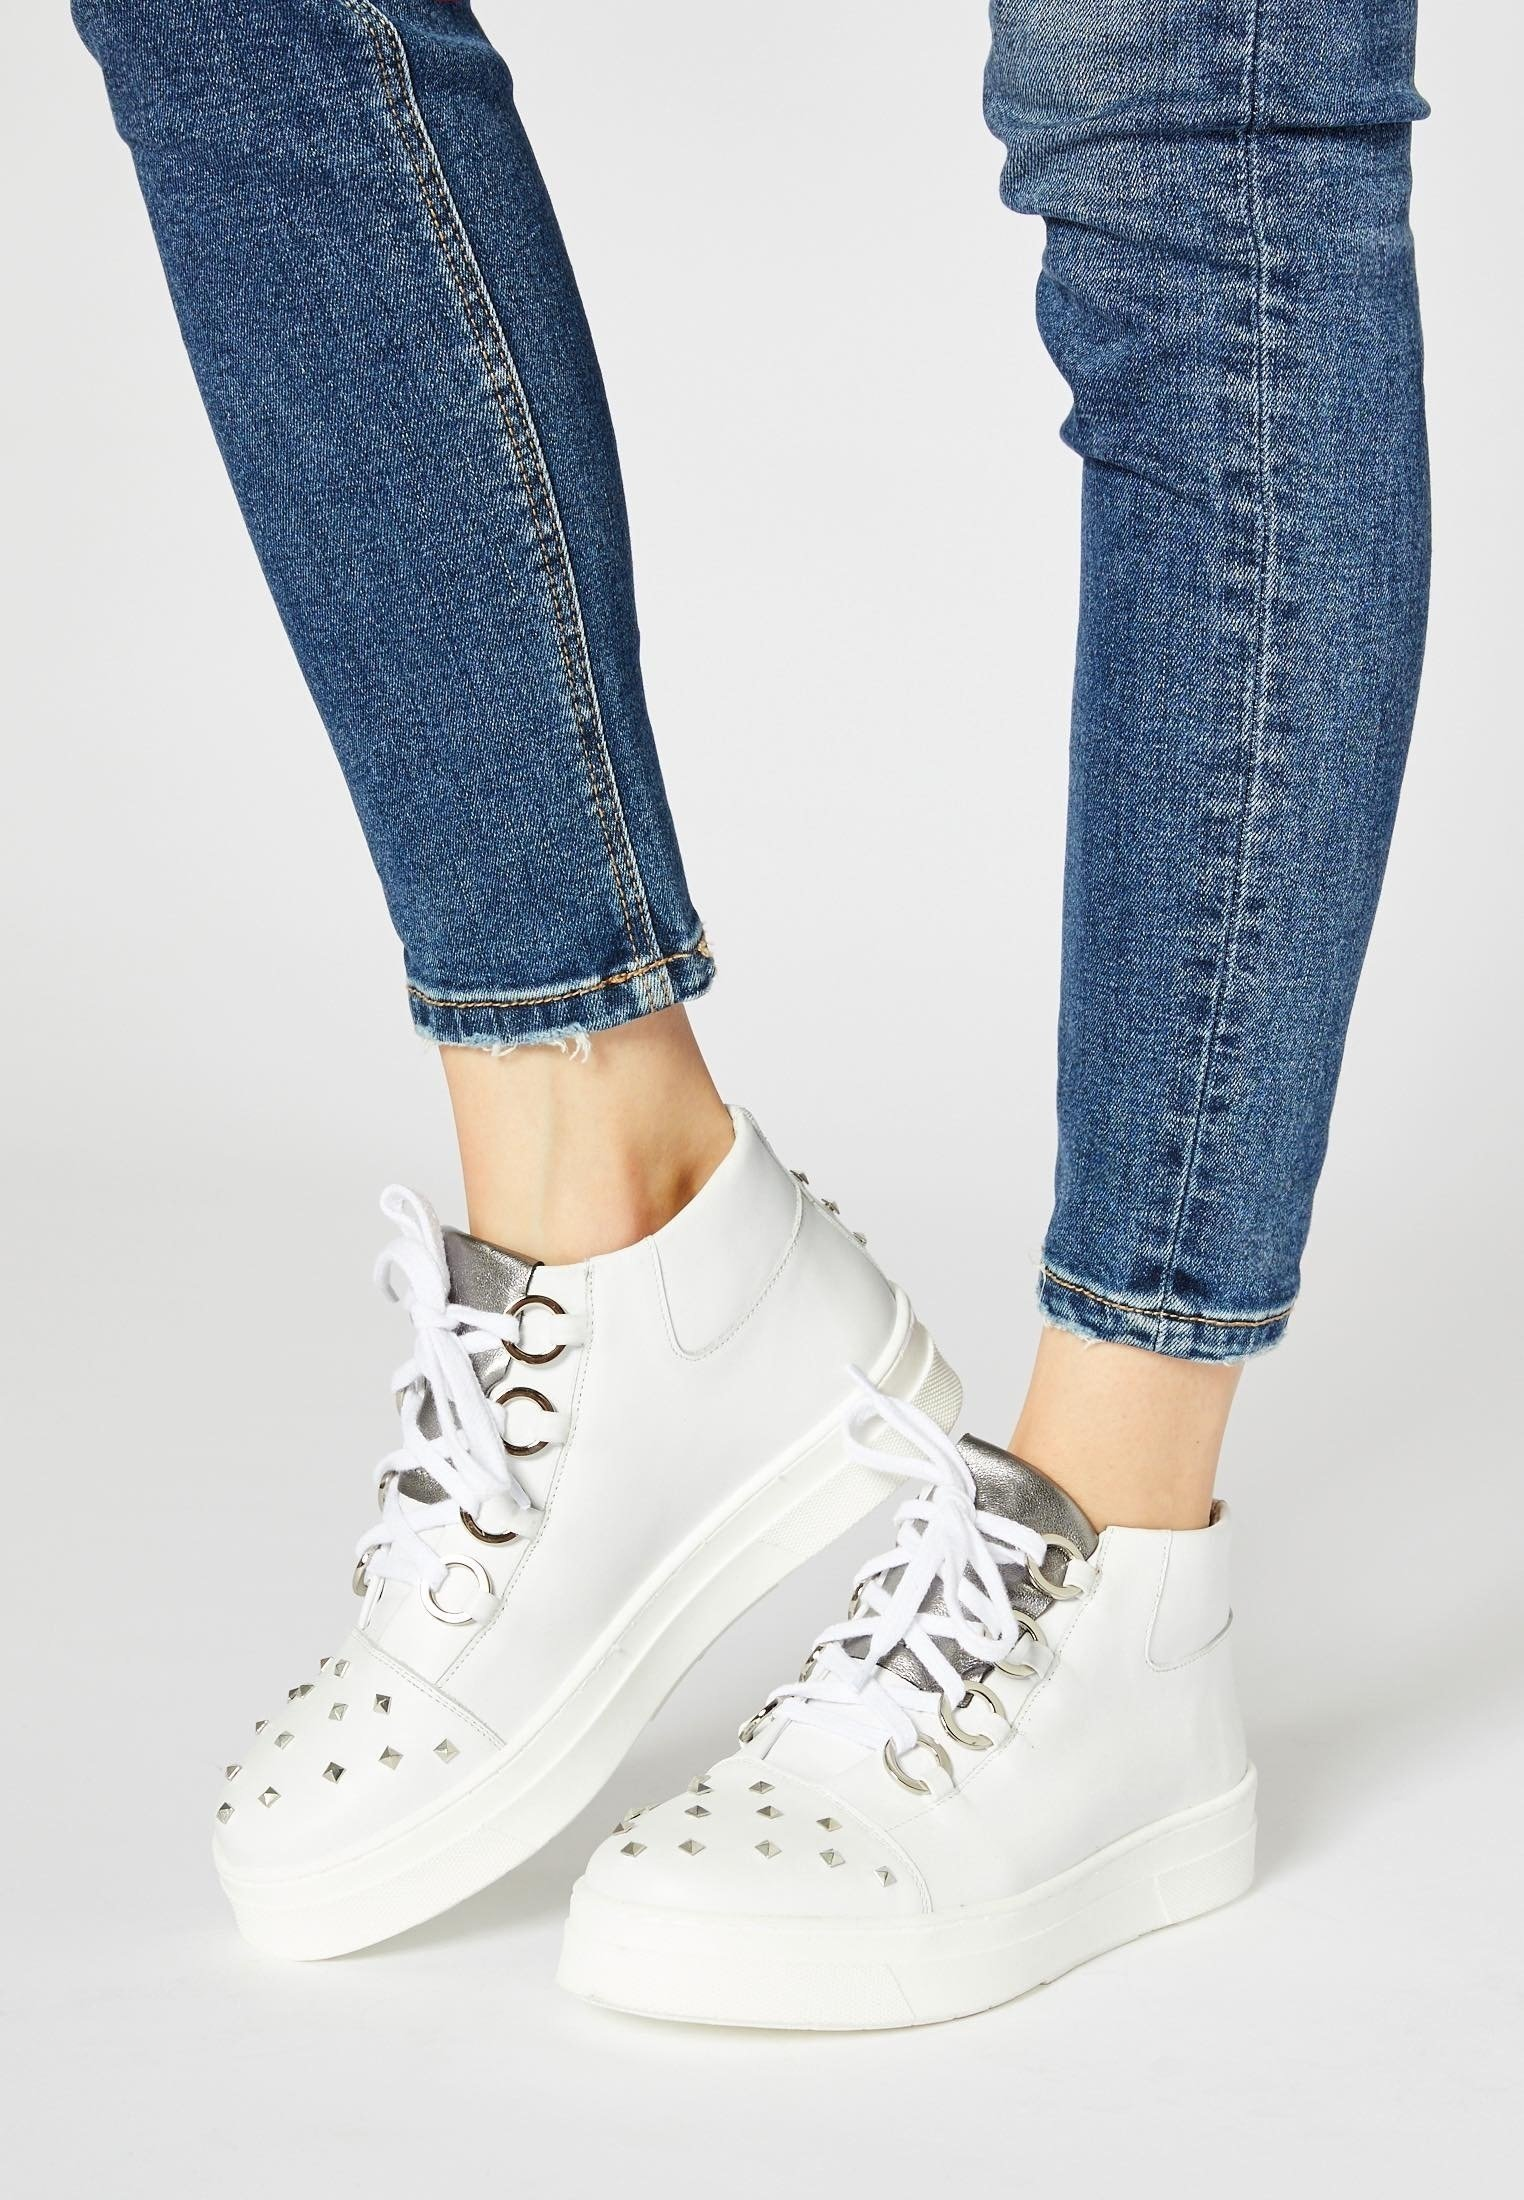 Alte Sneakers Alte Sneakers Mymo White Mymo 9eWIYEH2D